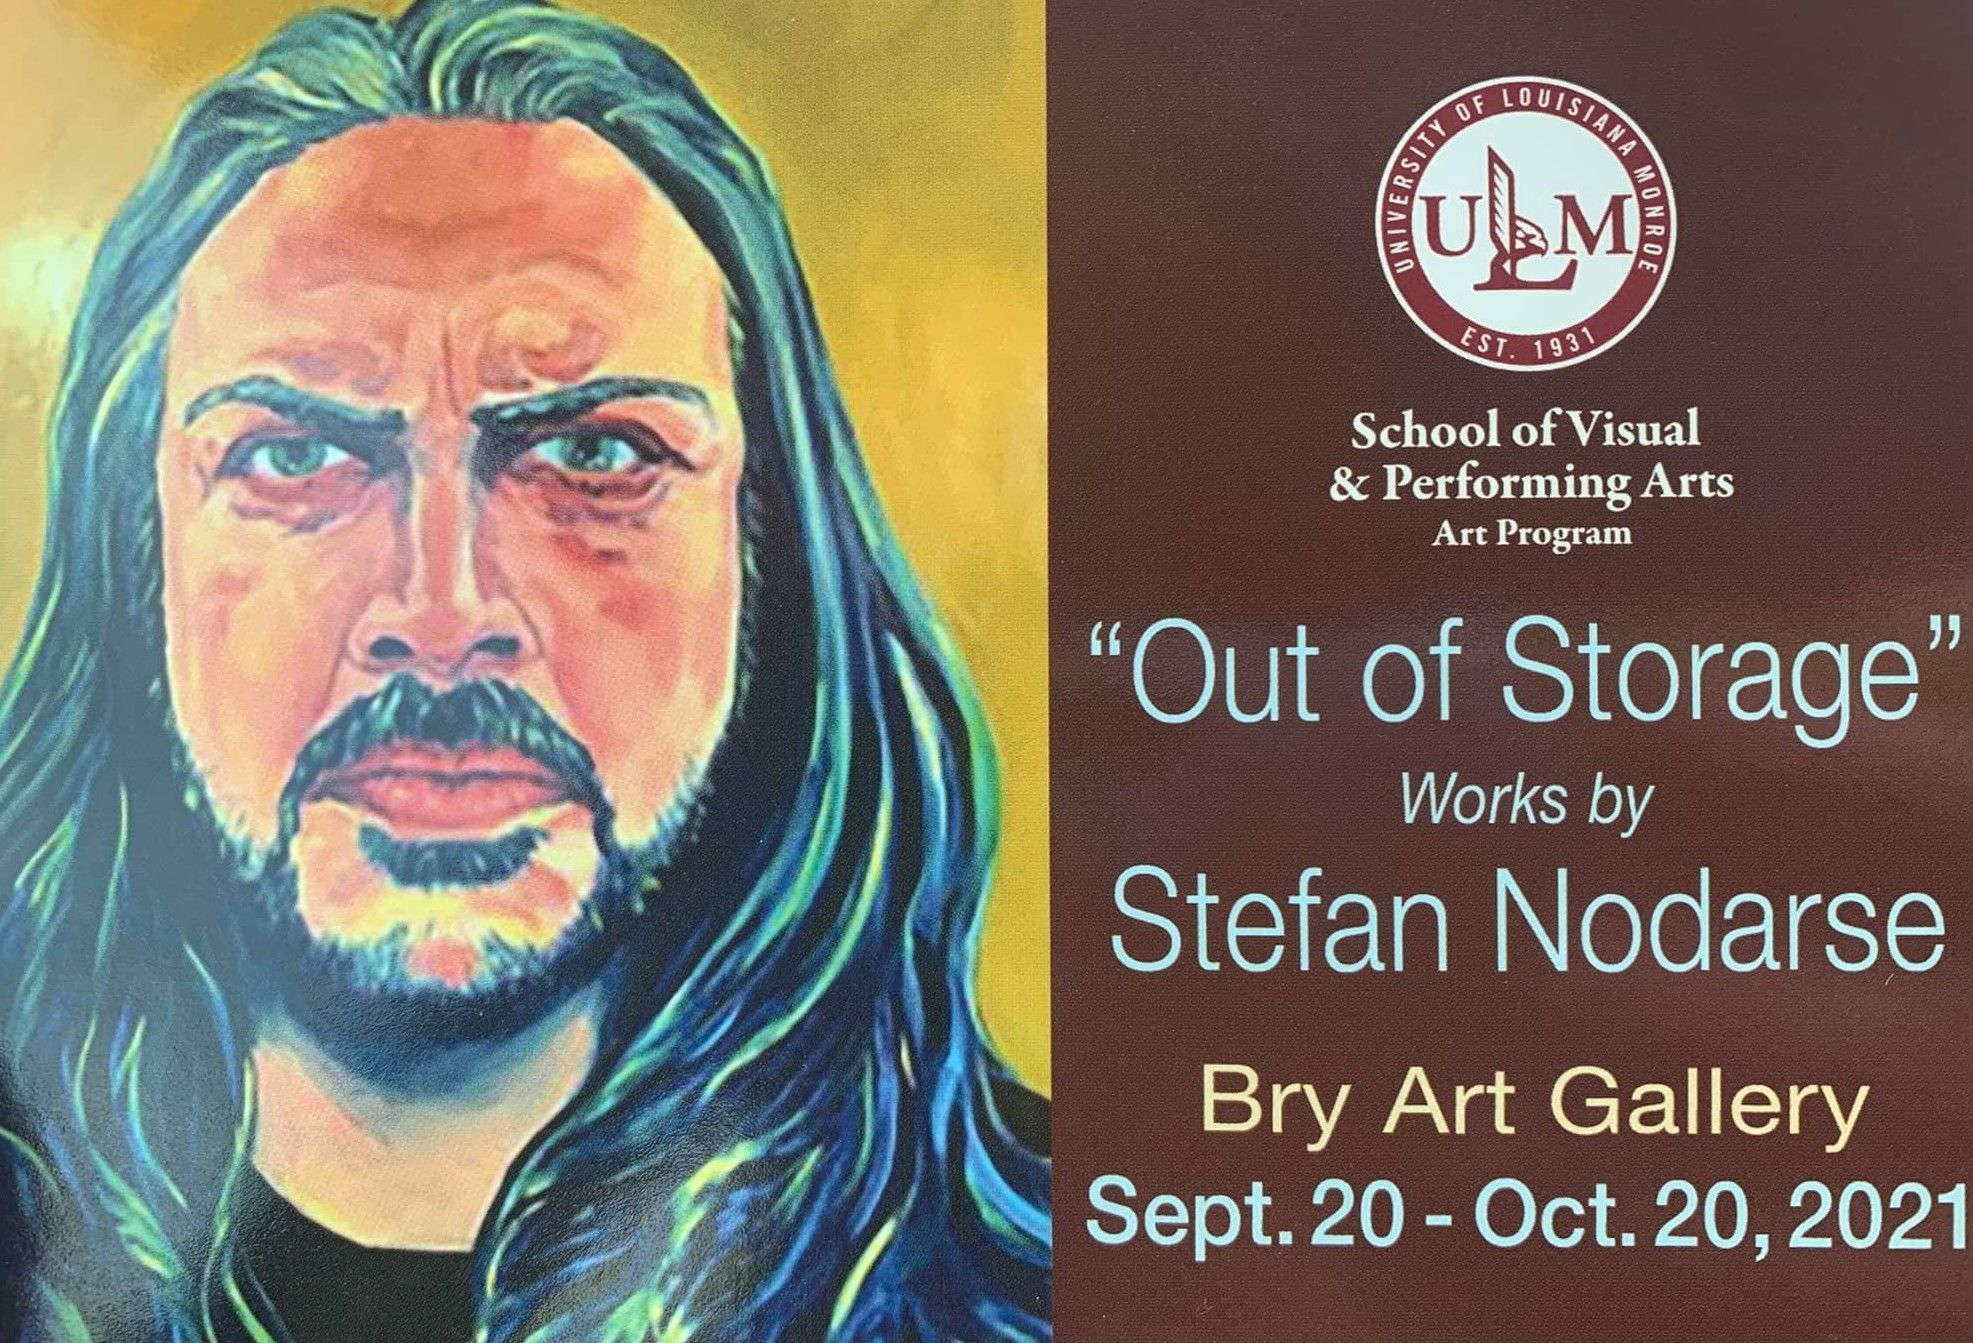 Artist Stefan Nodarse works showing at Bry Art Gallery